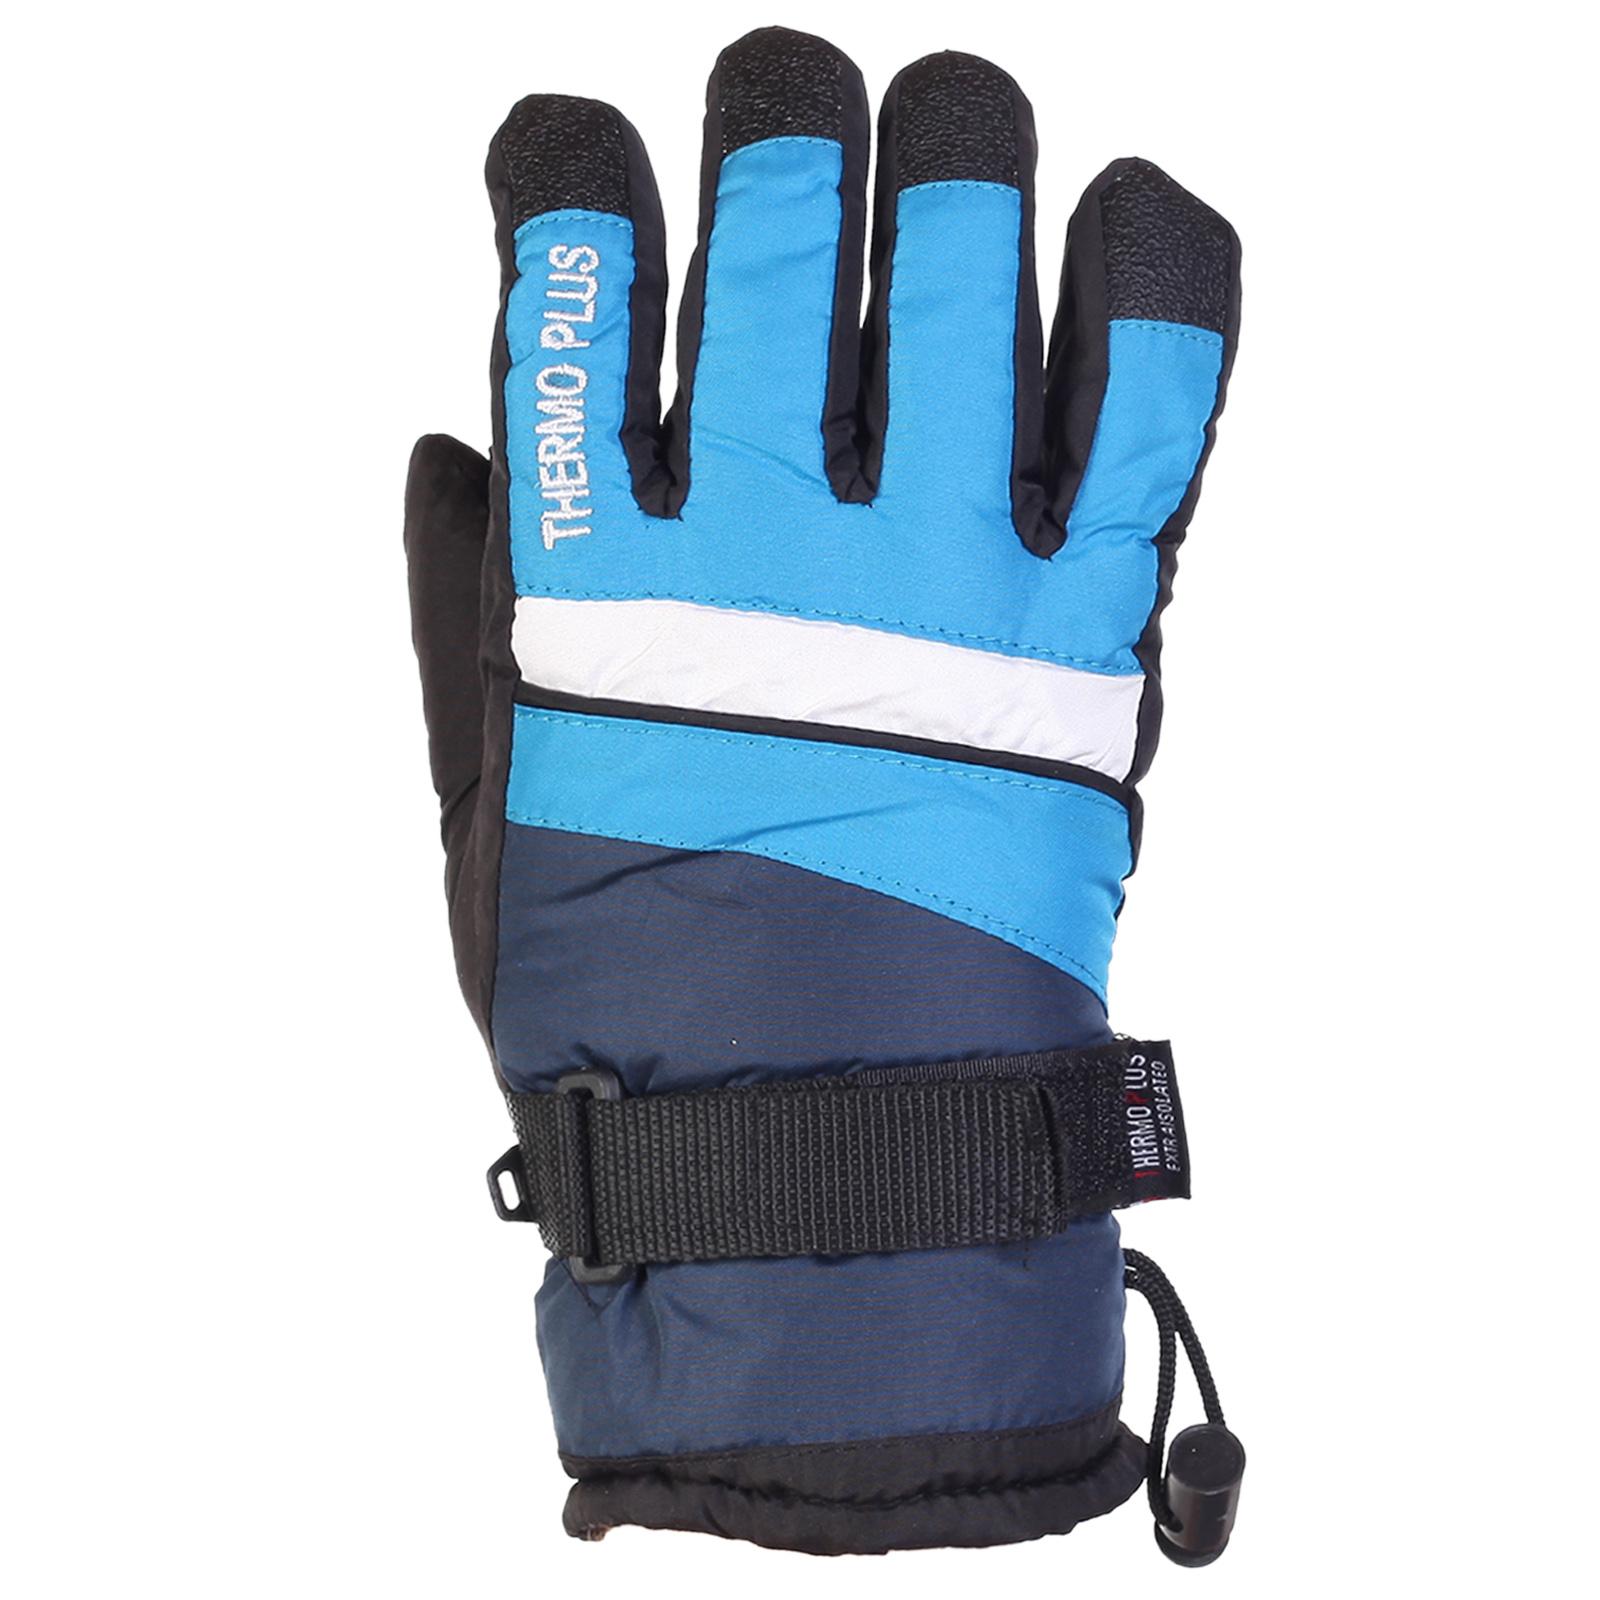 Продажа детских зимних перчаток оптом и в розницу